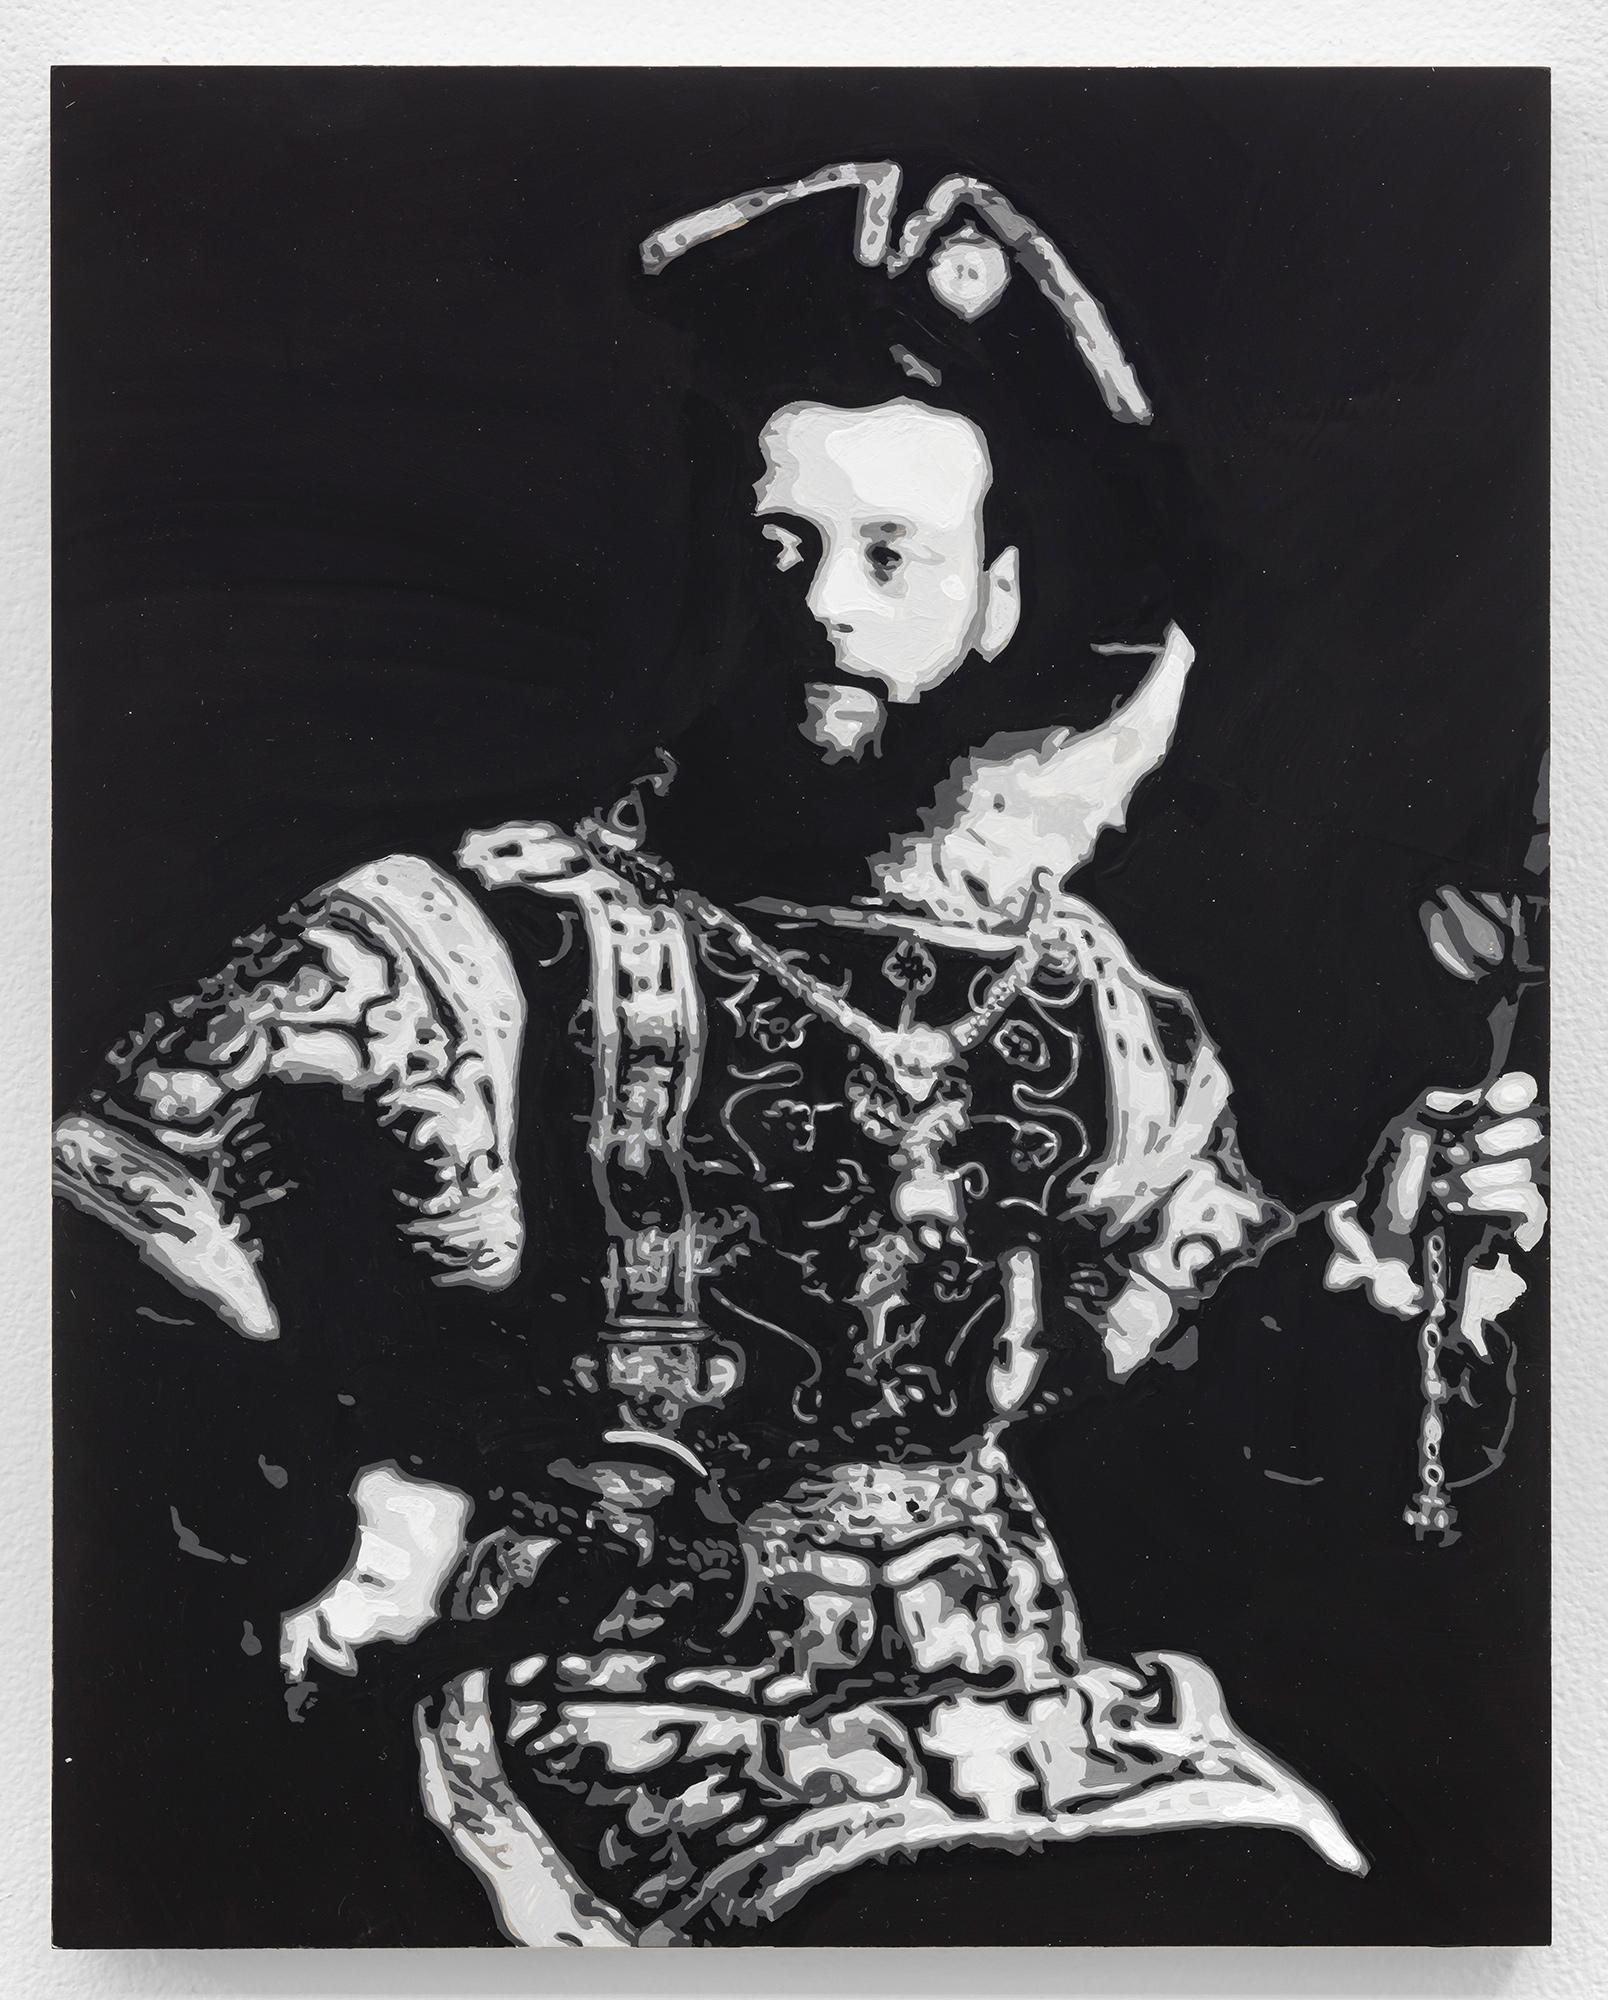 Dorian FitzGerald,  Nathan Rothschild, 1st Baron Rothschild , 2019, holbein acryla gouache on board, 8 x 10 inches